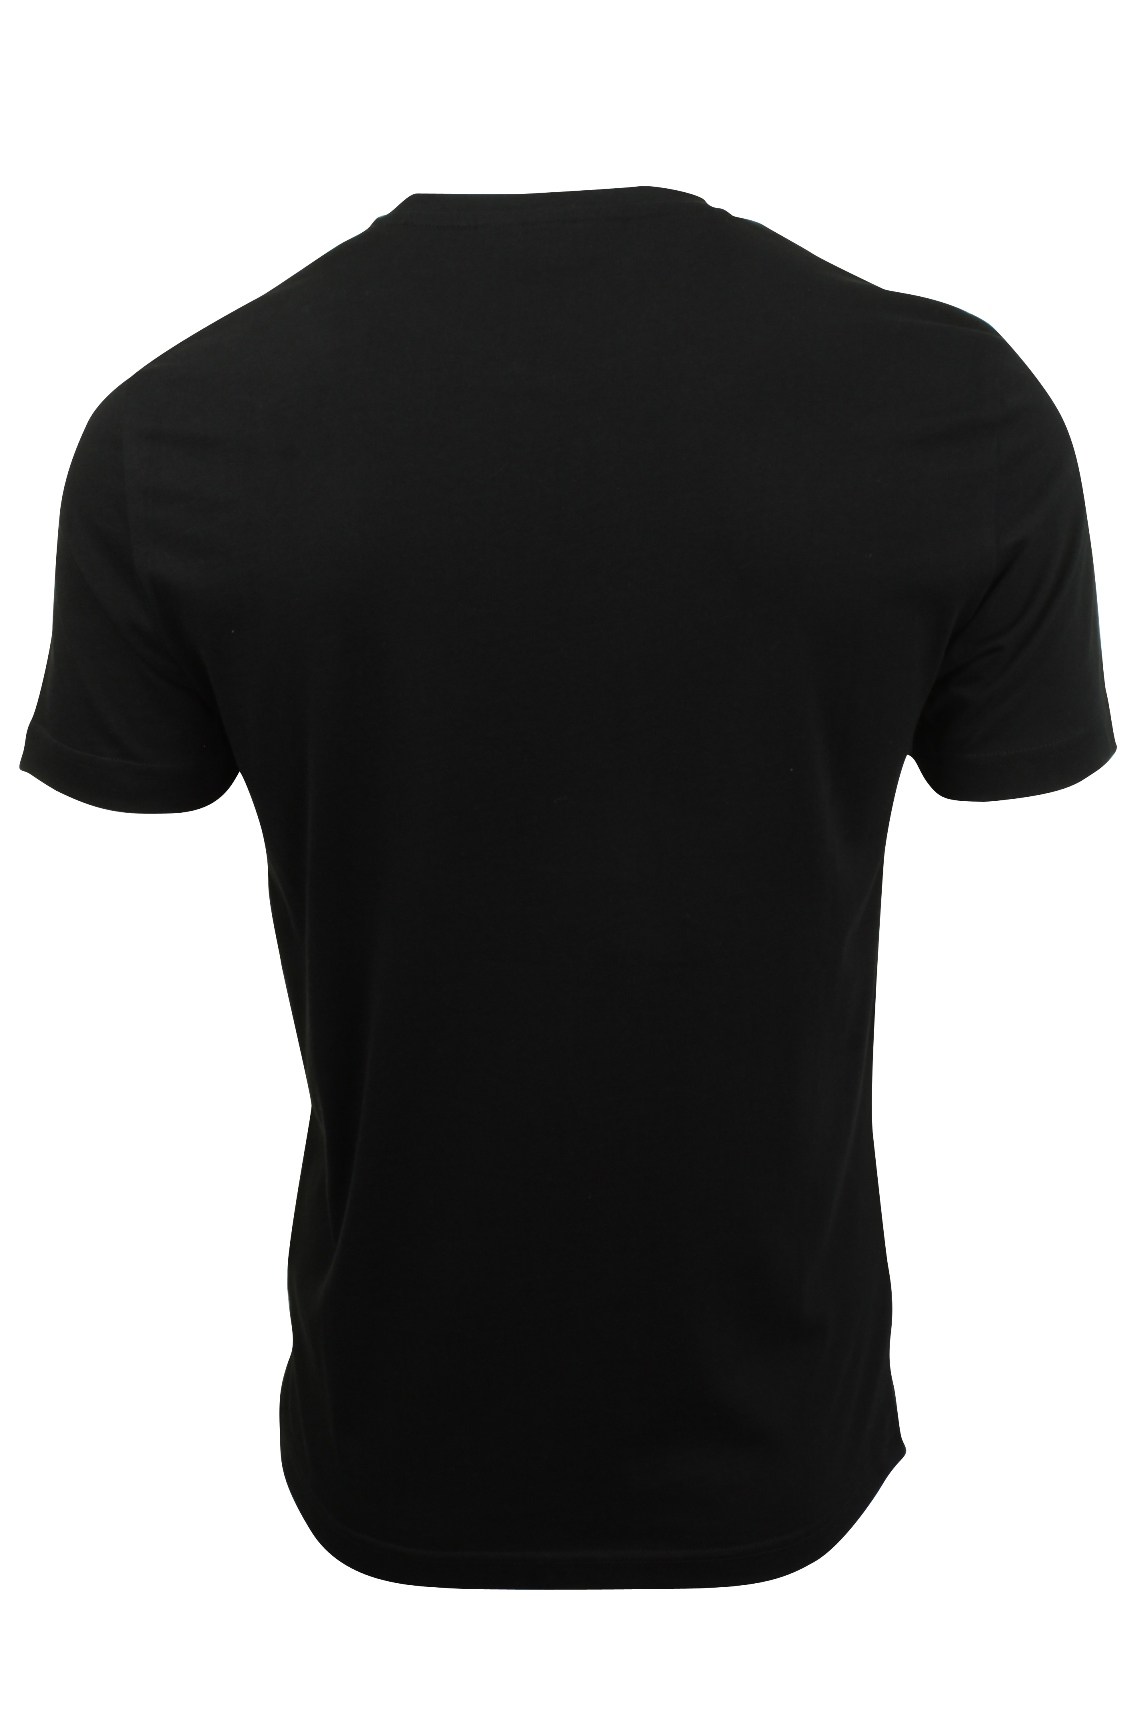 Mens t shirt by original penguin crew neck short sleeved for Mens crew neck tee shirts